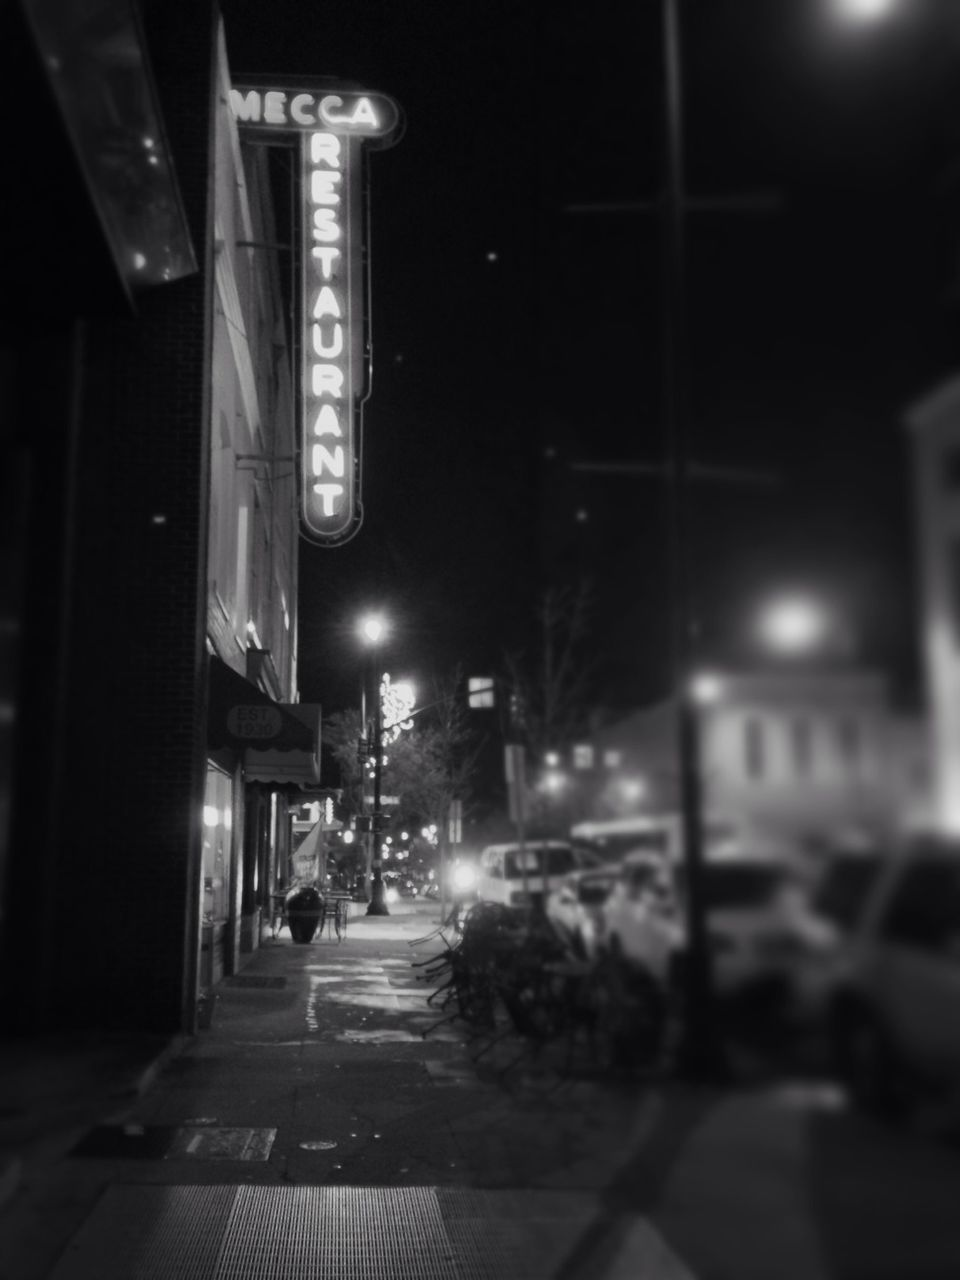 illuminated, night, street, lighting equipment, building exterior, street light, architecture, city, built structure, outdoors, stoplight, no people, sky